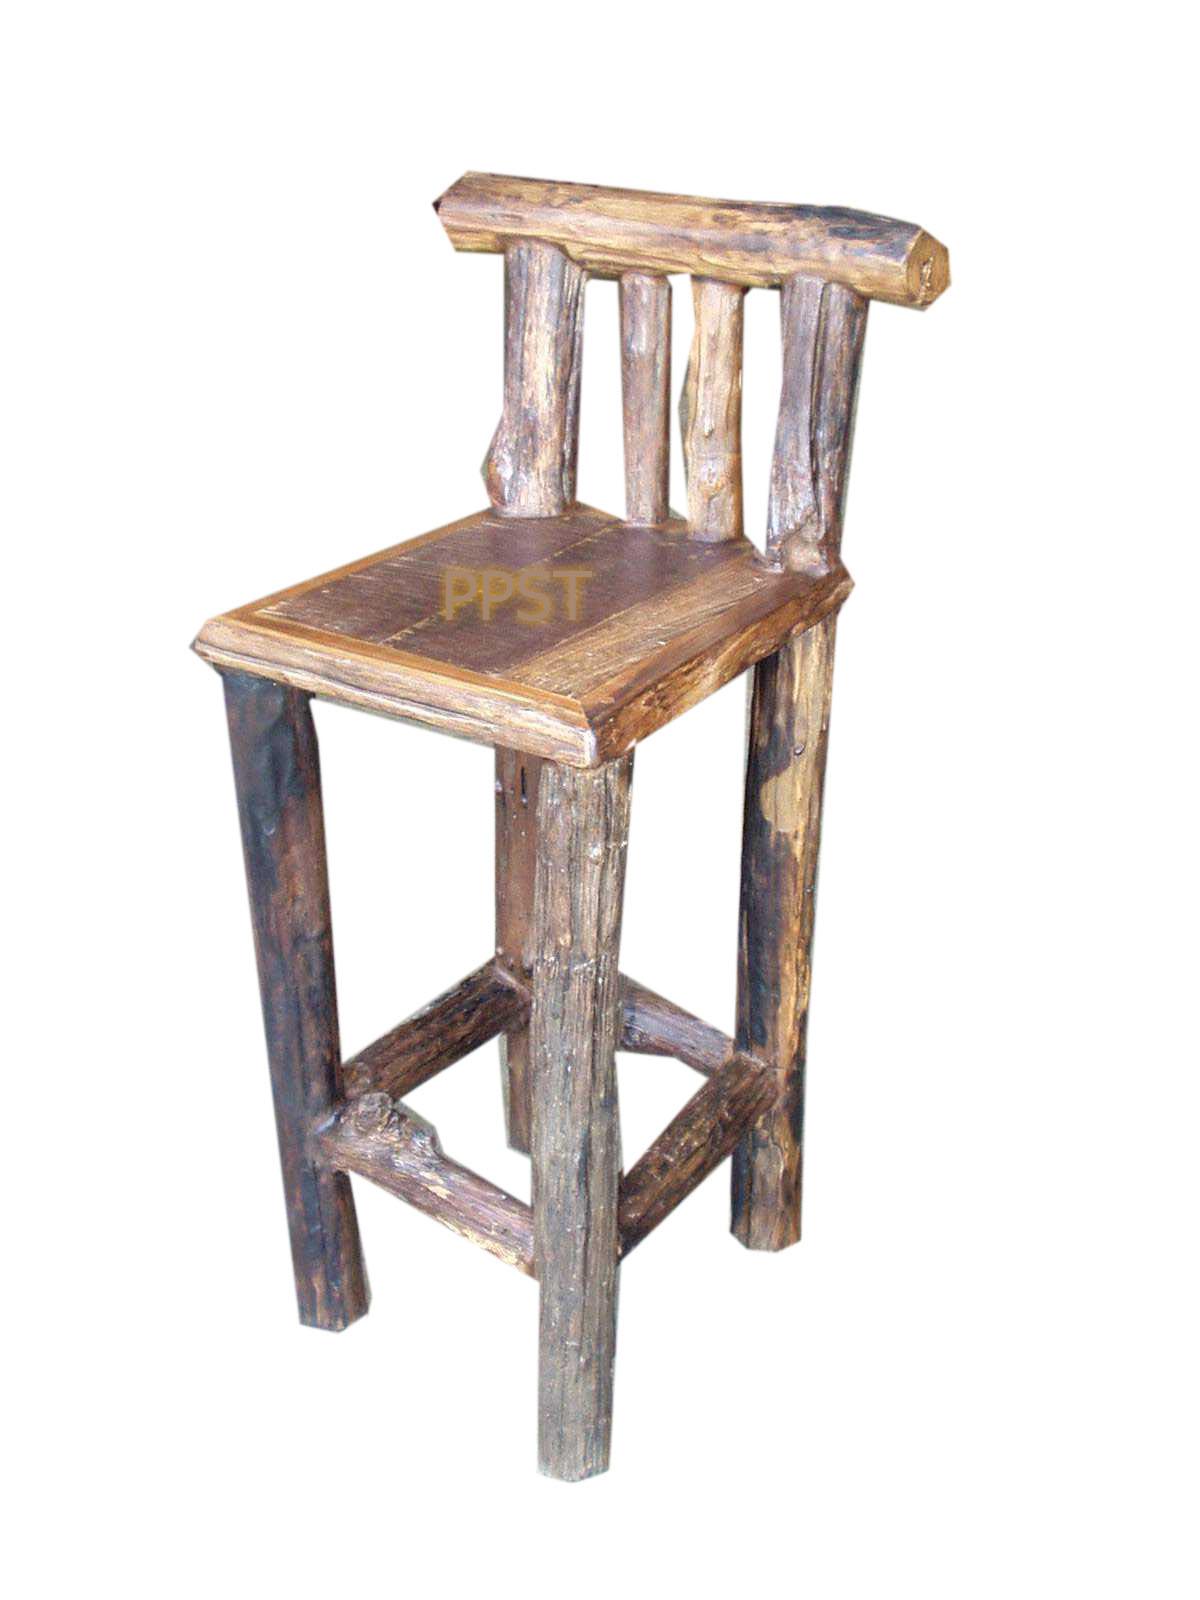 Antique stool-sn038